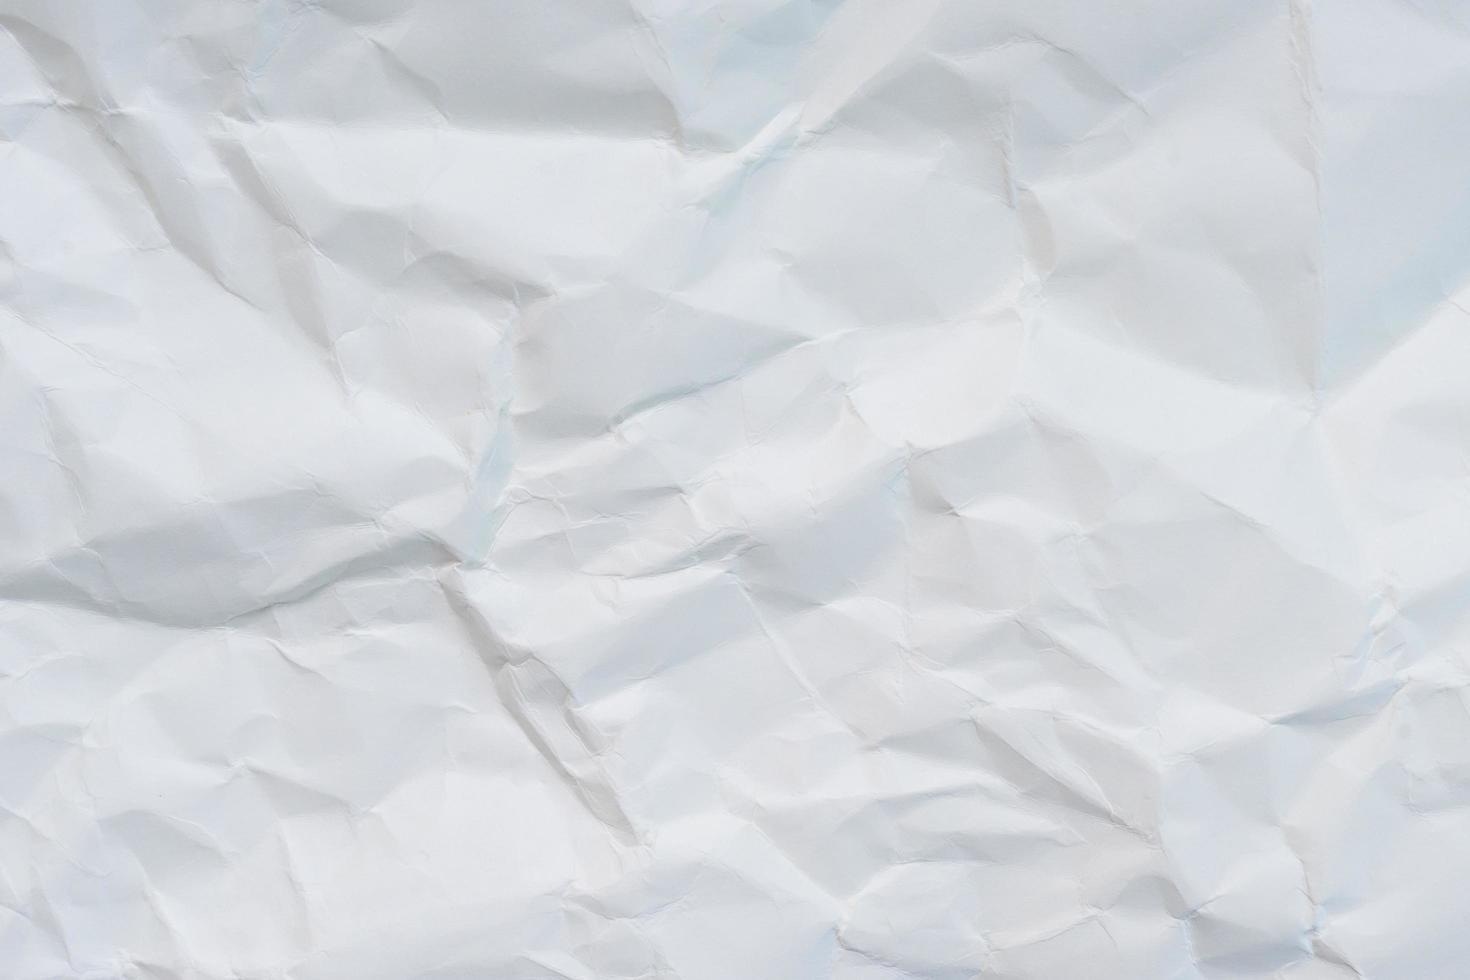 Crumpled paper texture photo